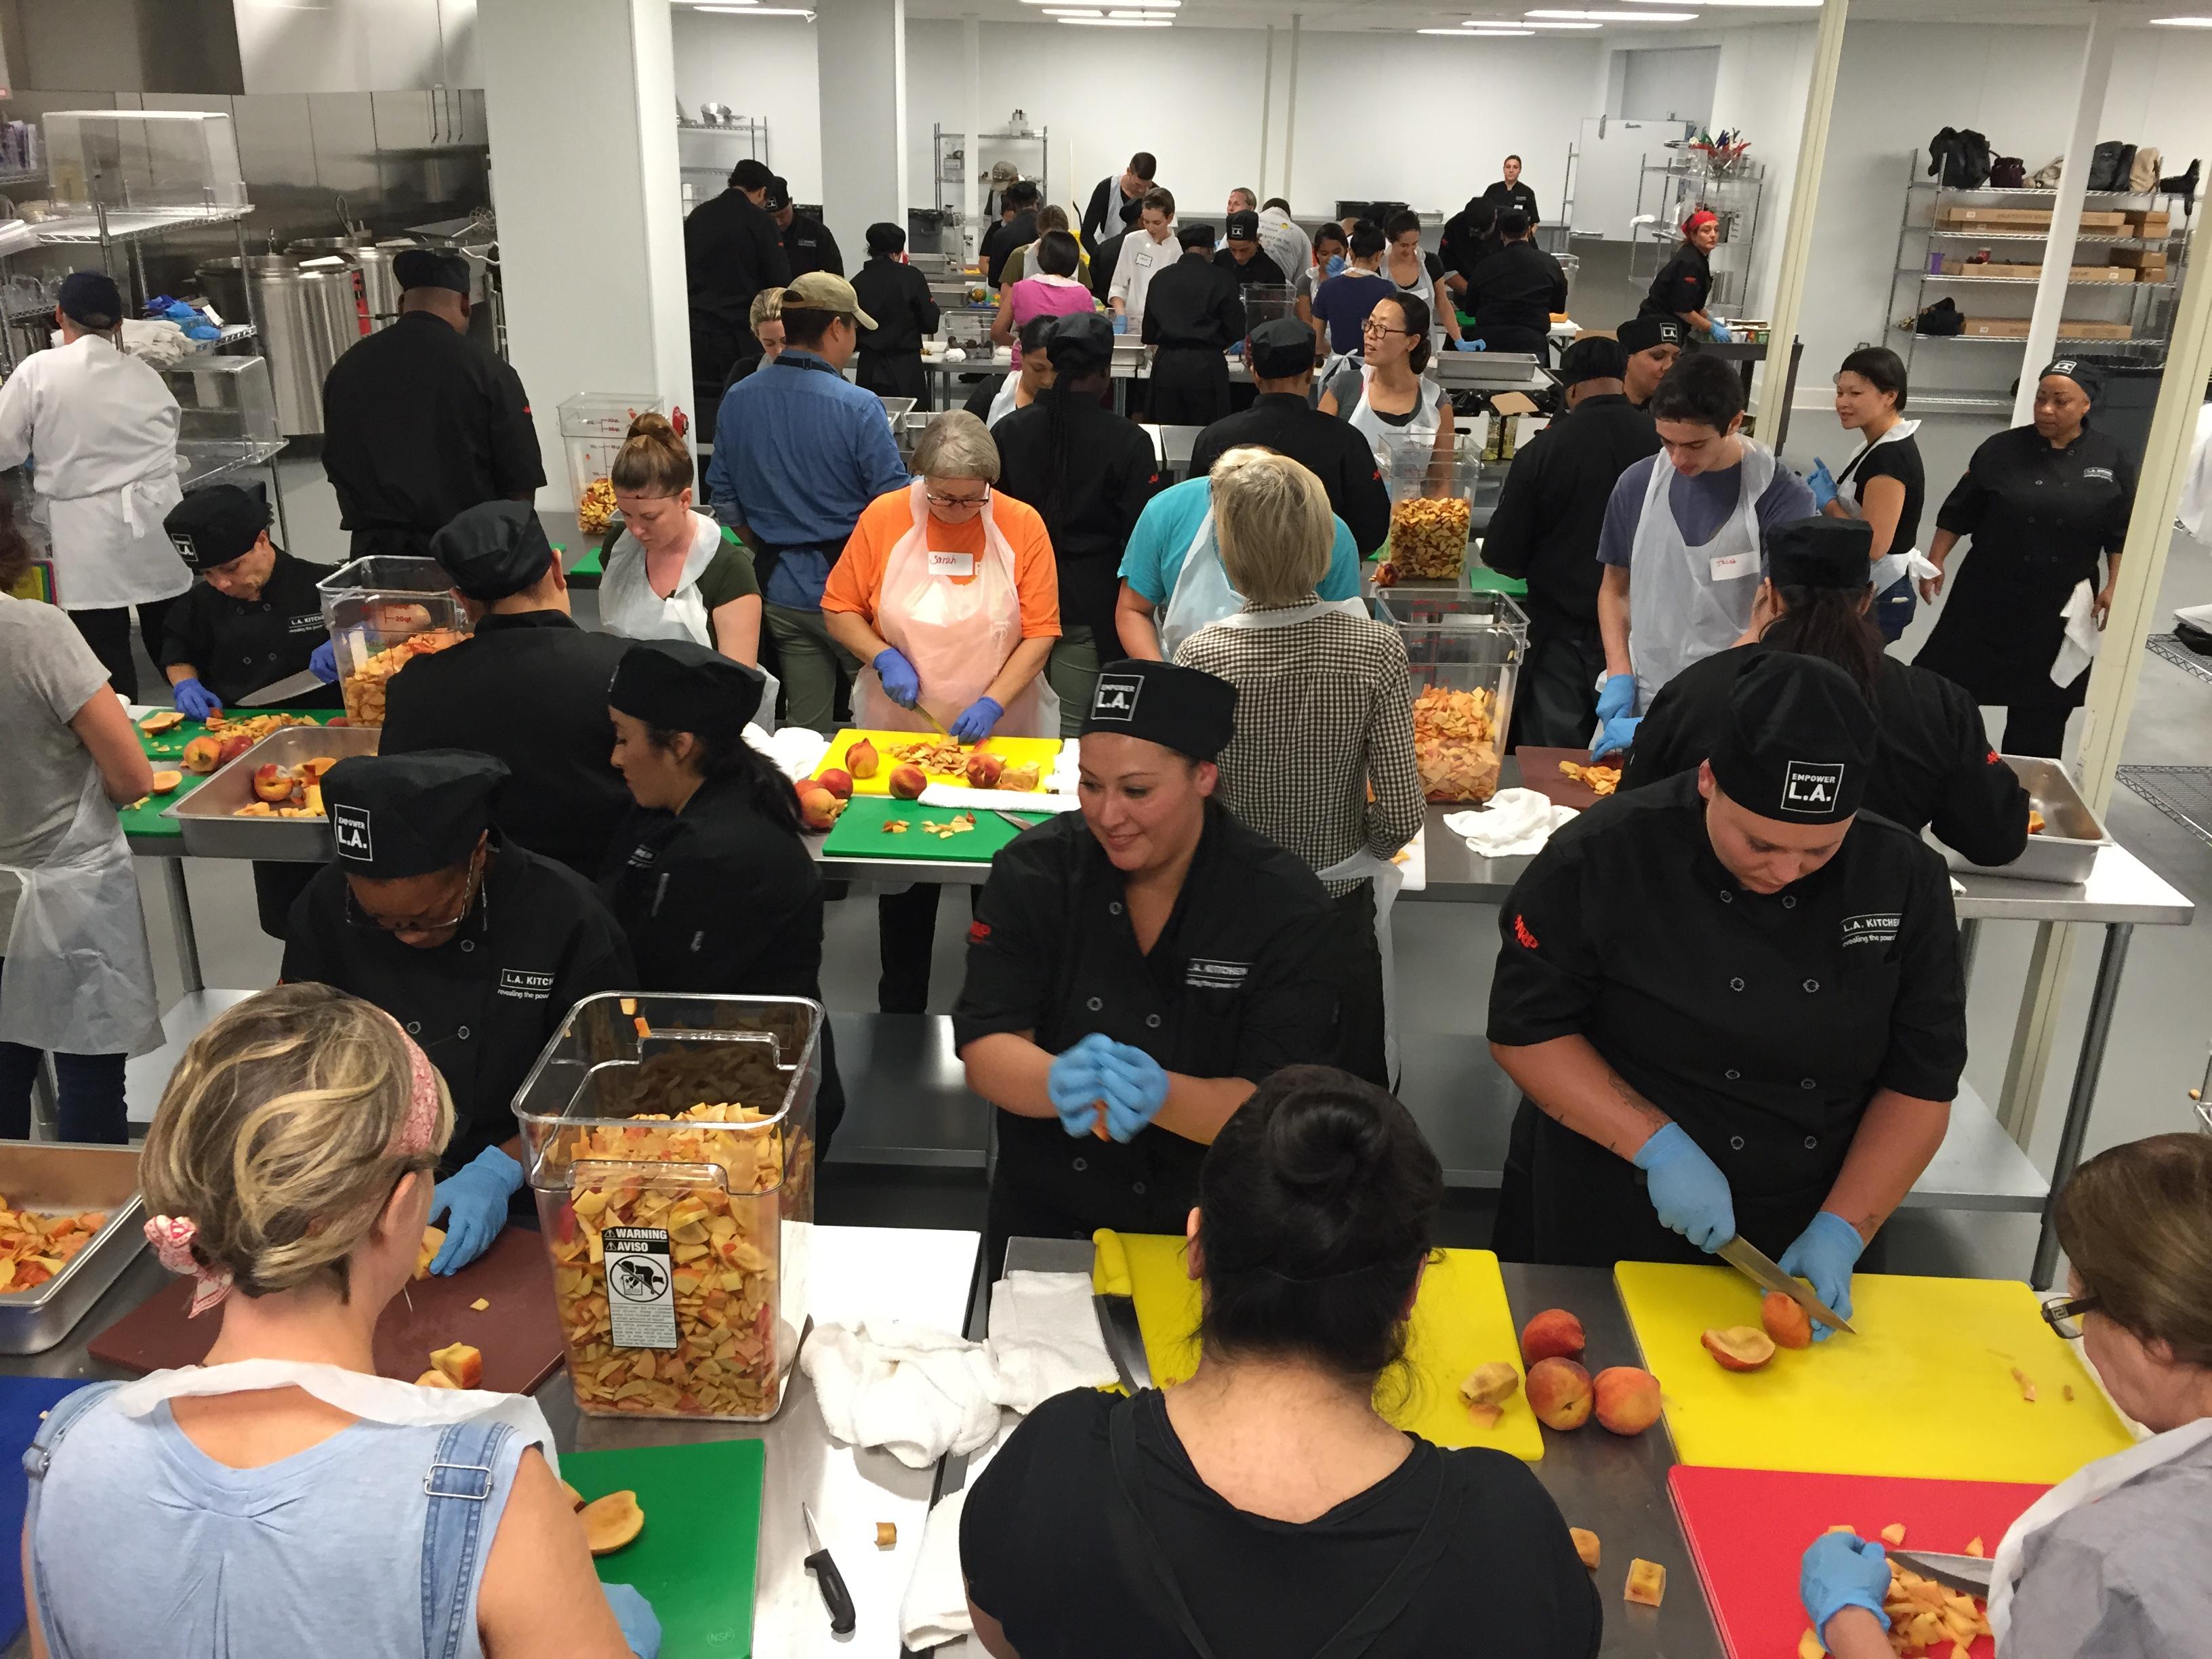 Teaching Kitchen Design cia, harvard partnership gives rise to teaching kitchens   food